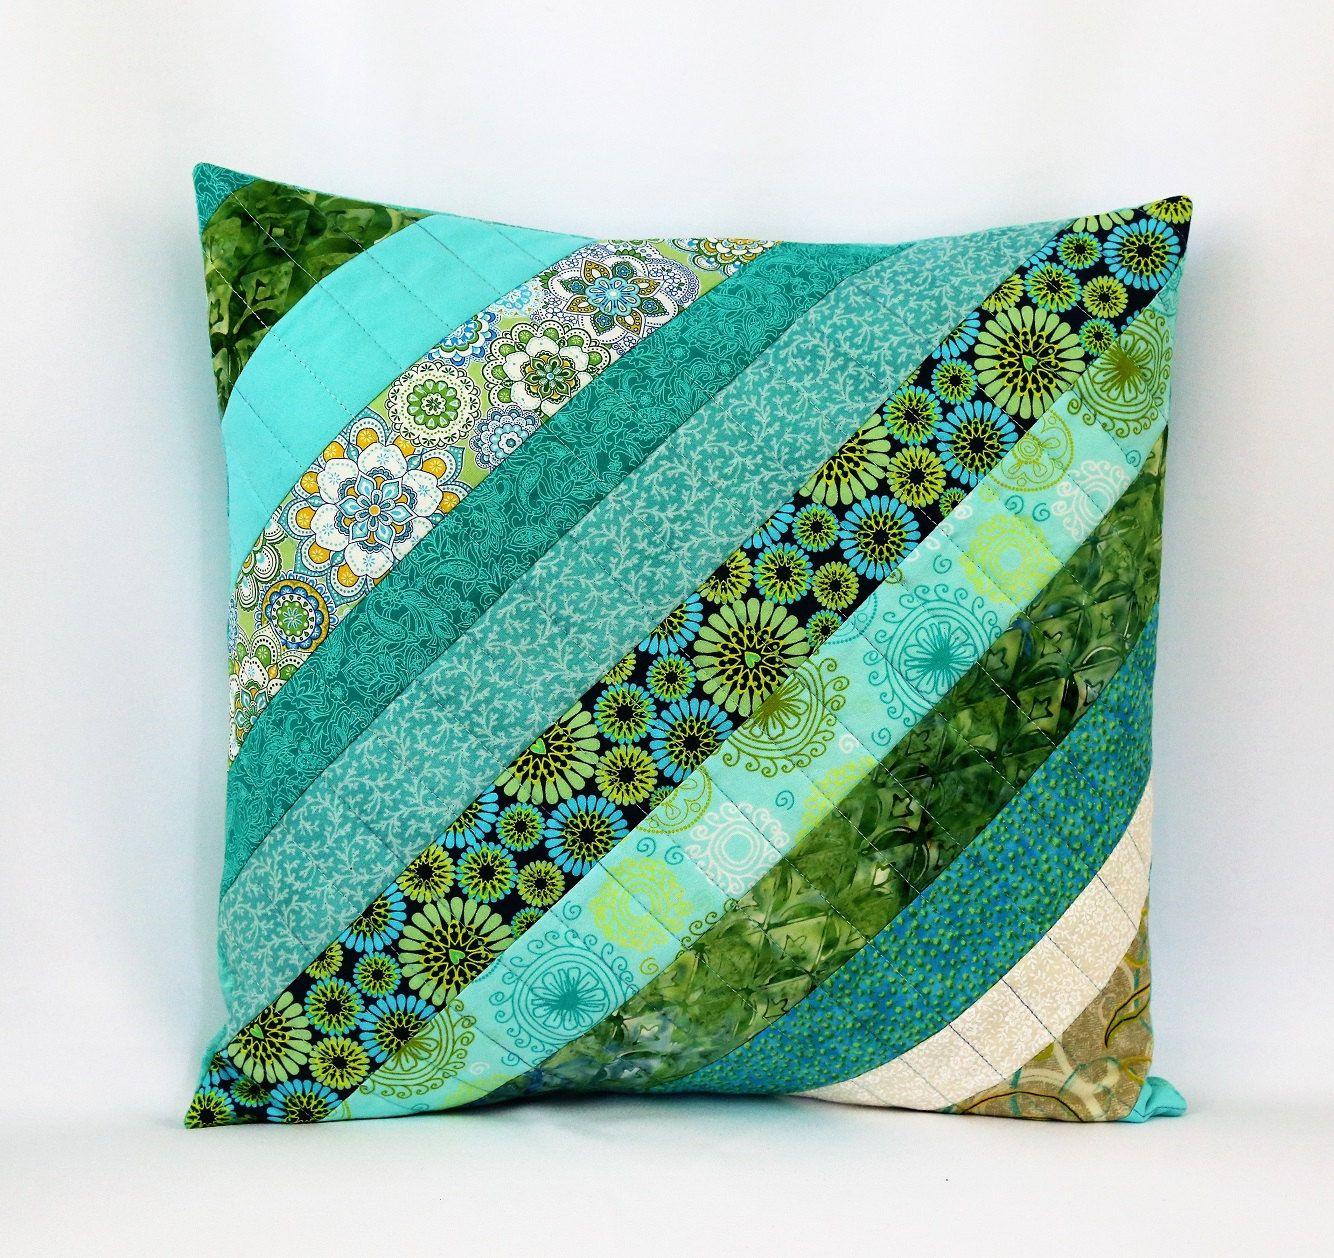 Patchwork Pillow Quilted Pilllow Cover Throw Pillow 16